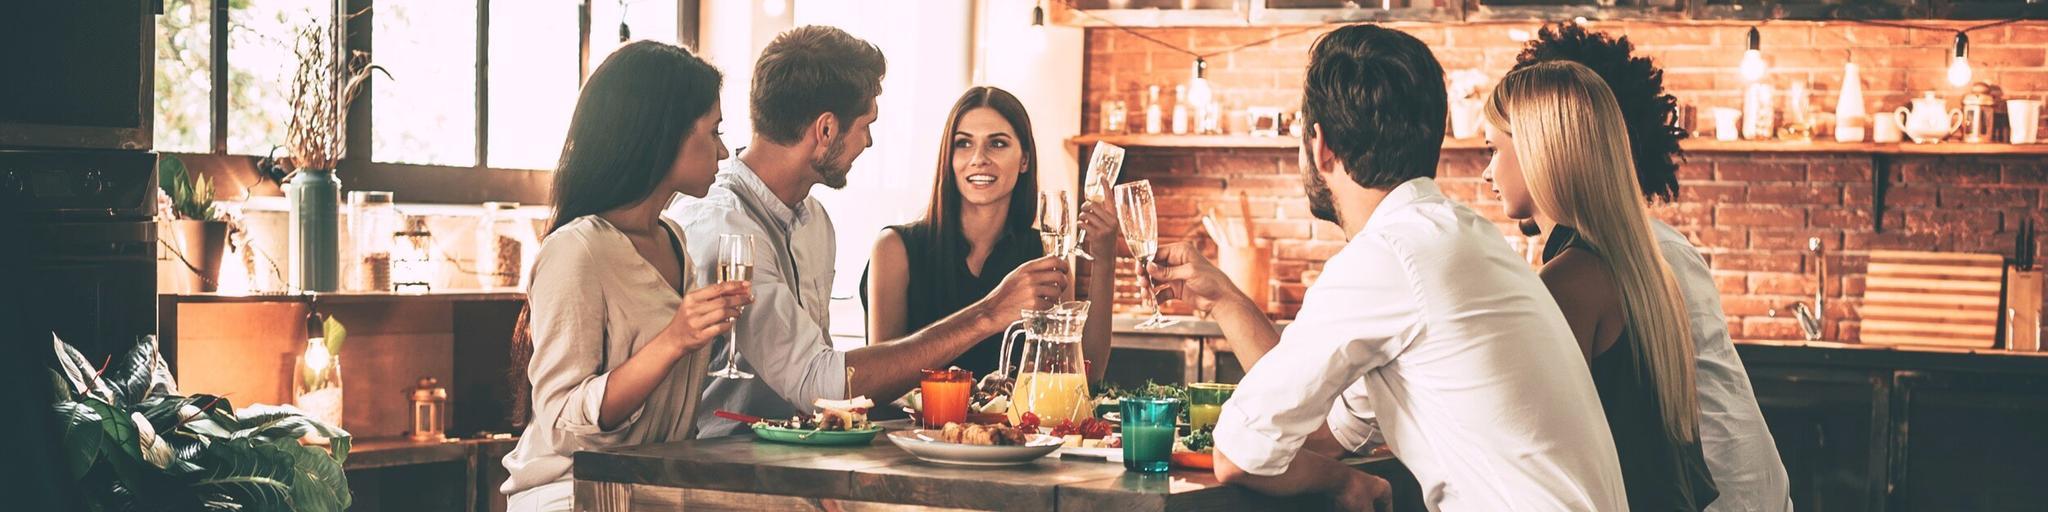 Servies, Glaswerk, Bestek, Borden, Hygiëne,  Specialist in Horeca Non food Company, Restaurants, Bar, Cafe, Hotel, Glazen, Horeca serves,  banner 1